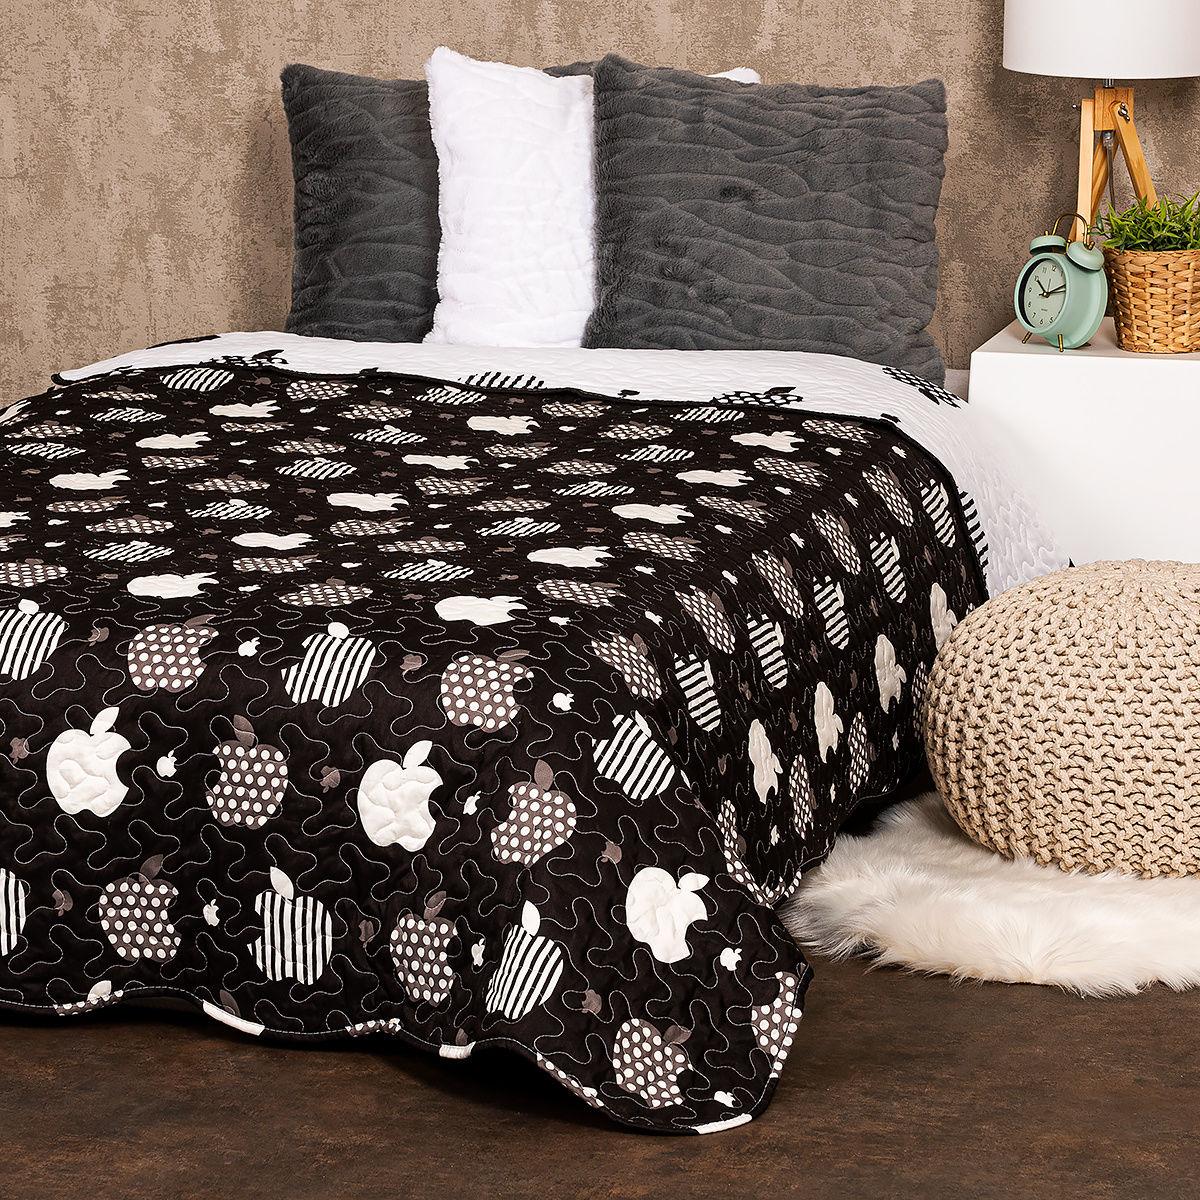 4Home Narzuta na łóżko Black fruit, 140 x 220 cm